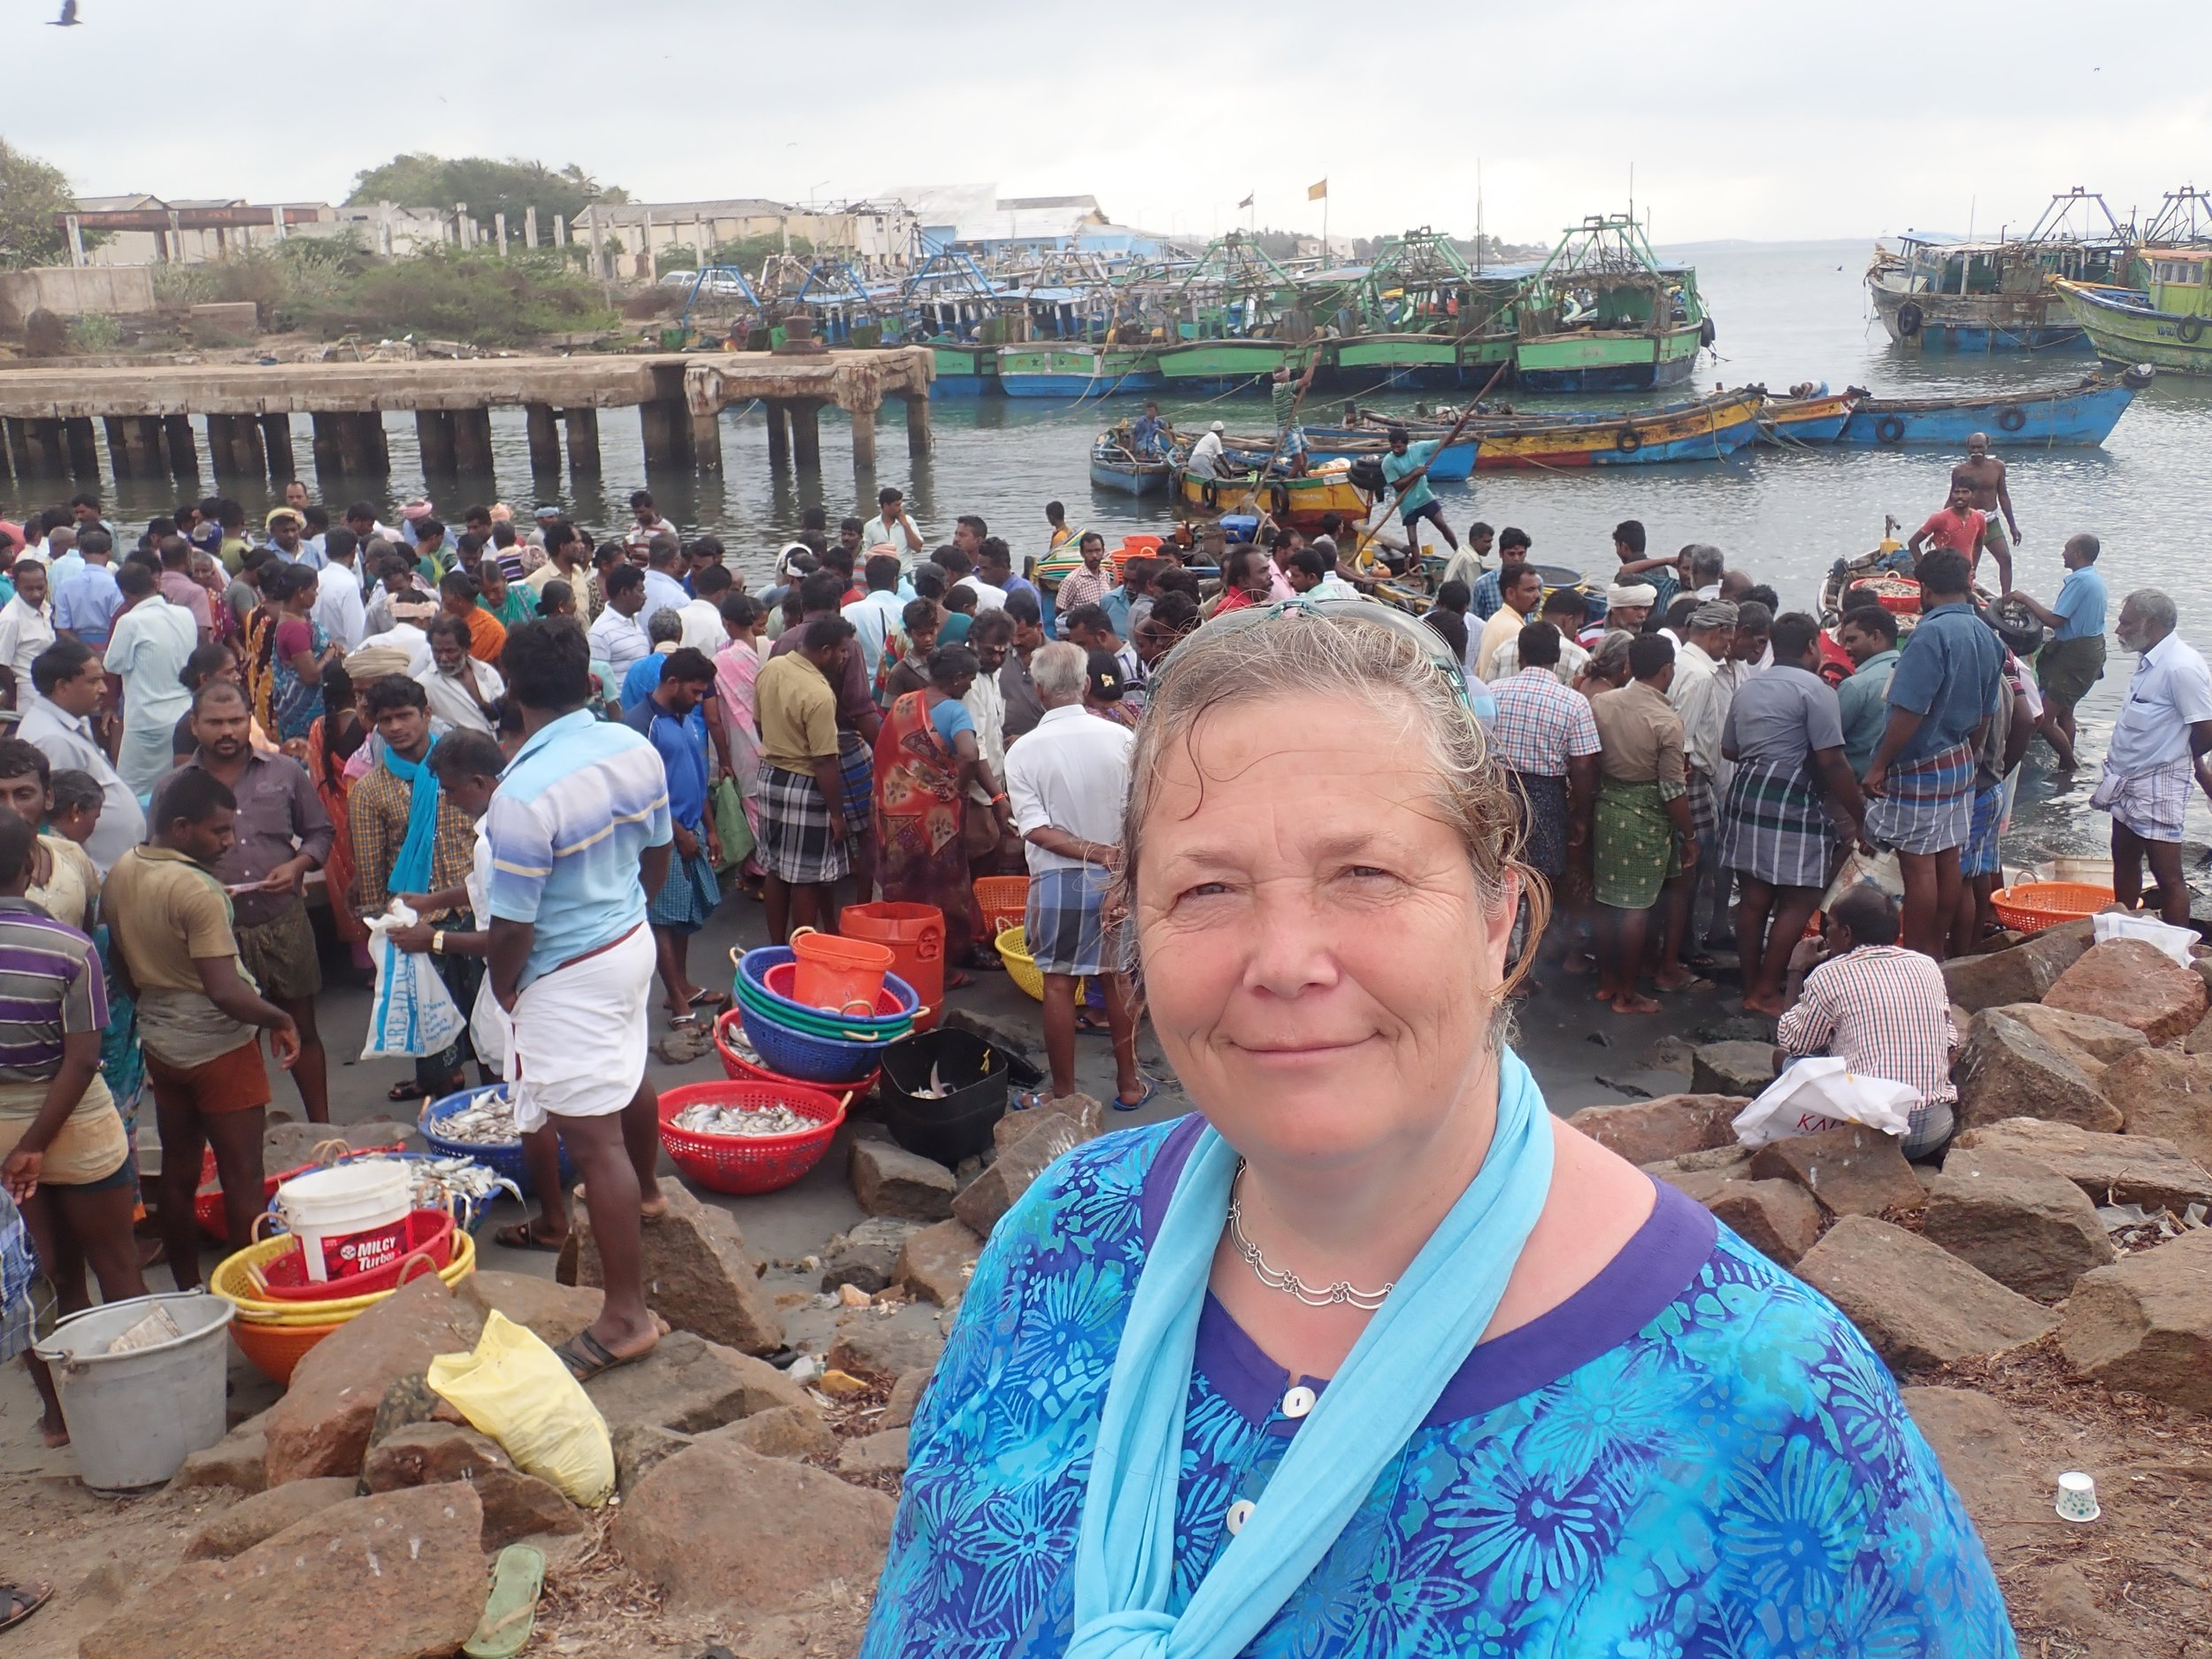 Amanda Vincent at a trawl landing site in Mandapam South, India. Photo by Amanda Vincent/Project Seahorse.